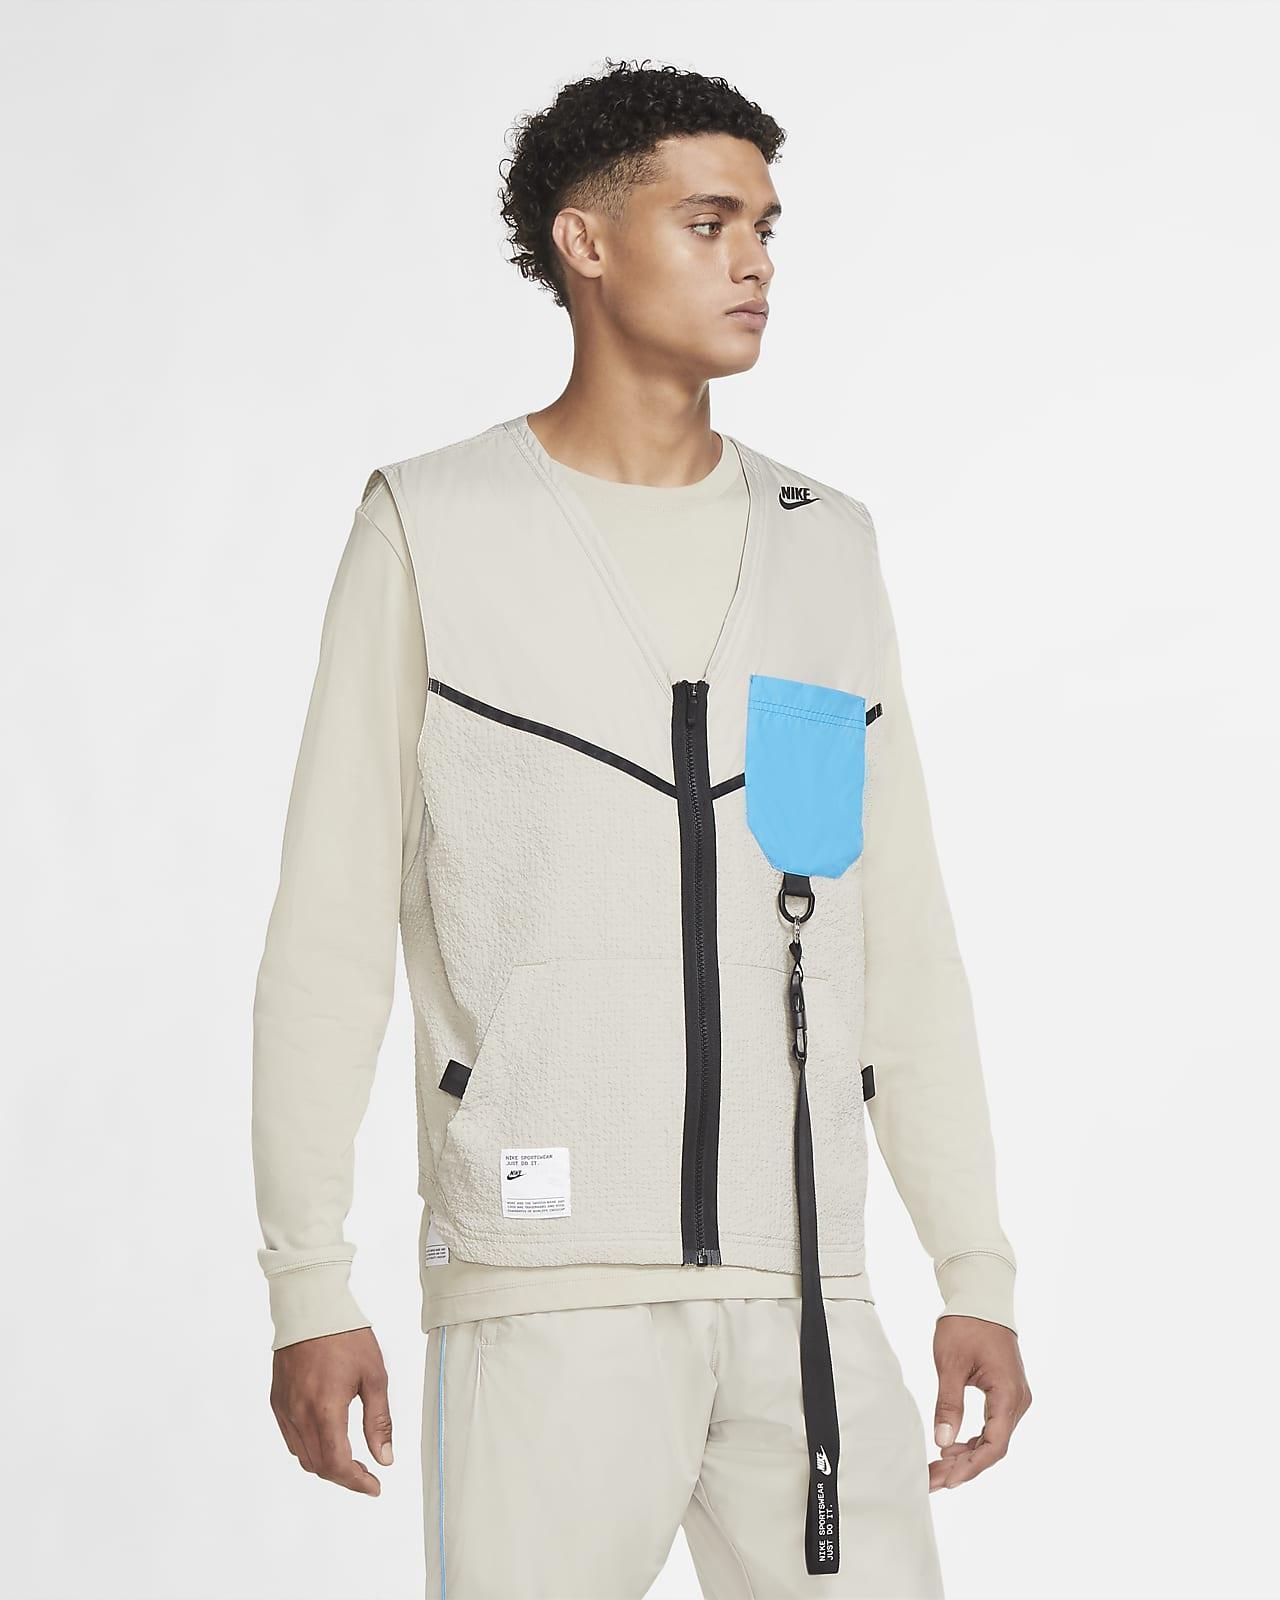 Chaleco de tejido Woven para hombre Nike Sportswear